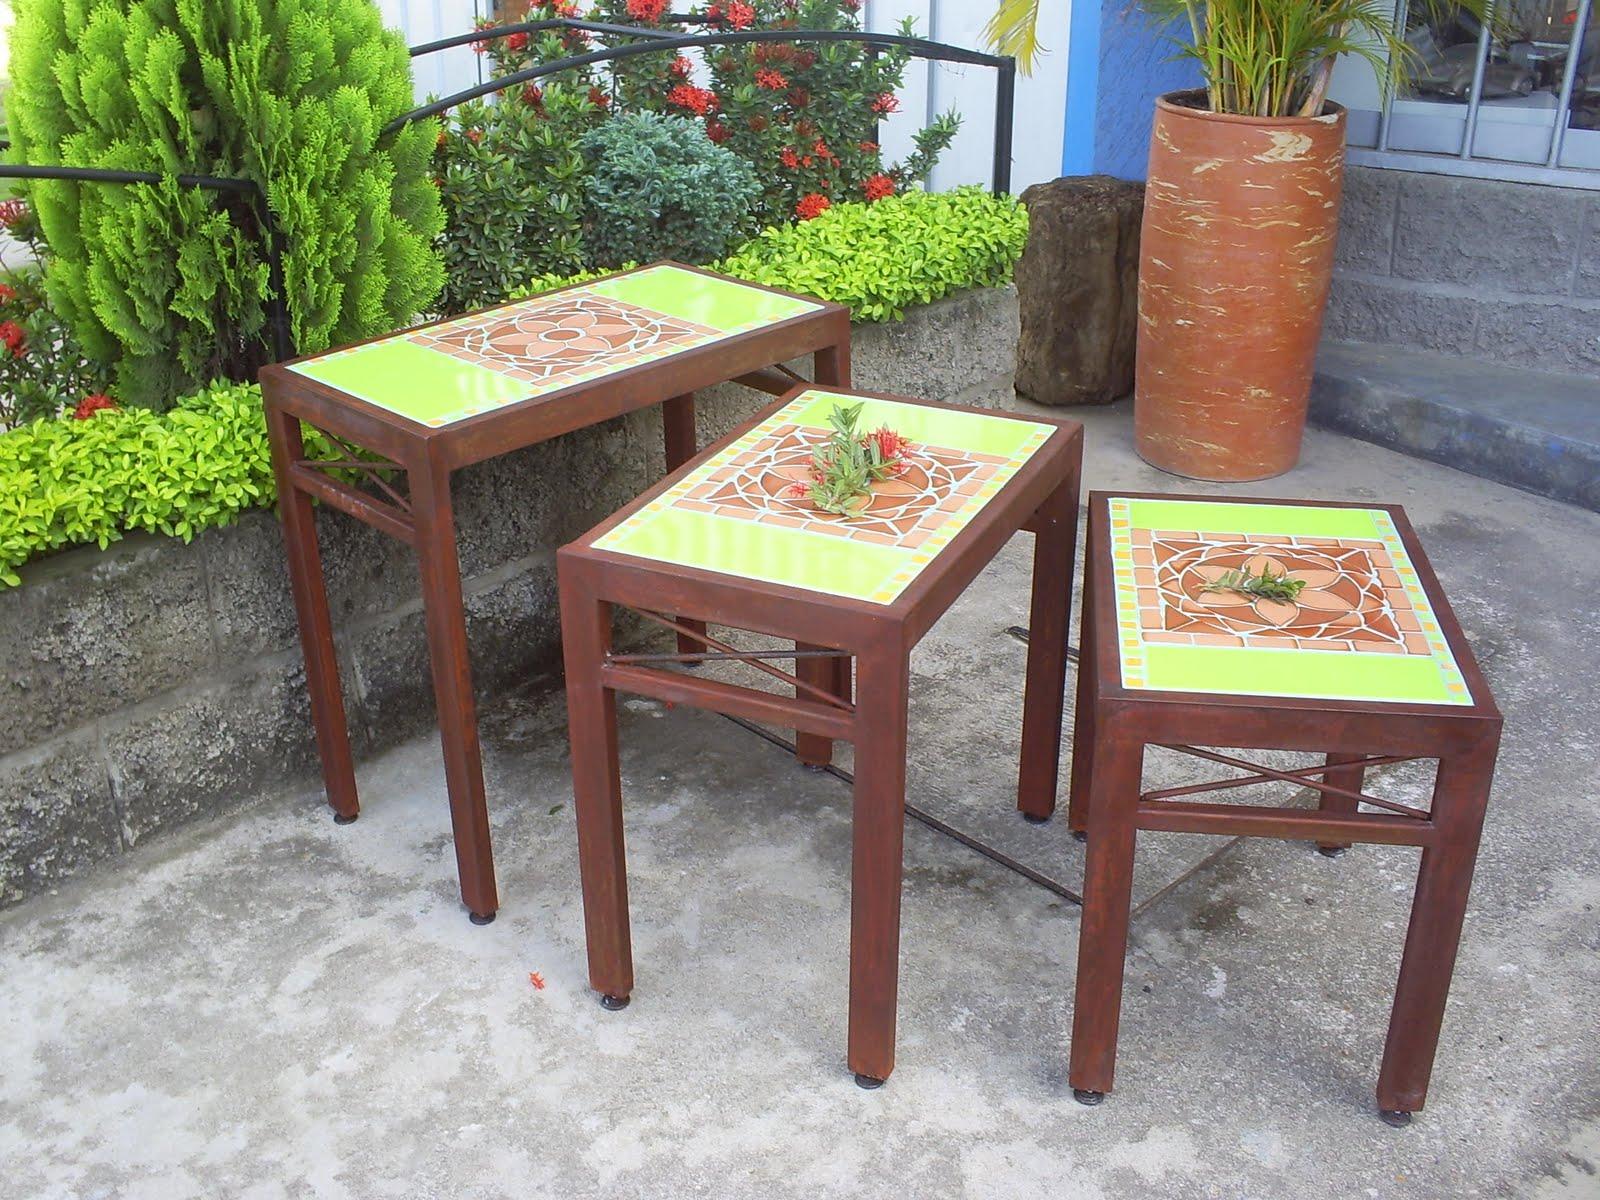 Mesas en hierro forjado tapa en ceramica delgo for Mesas de hierro forjado